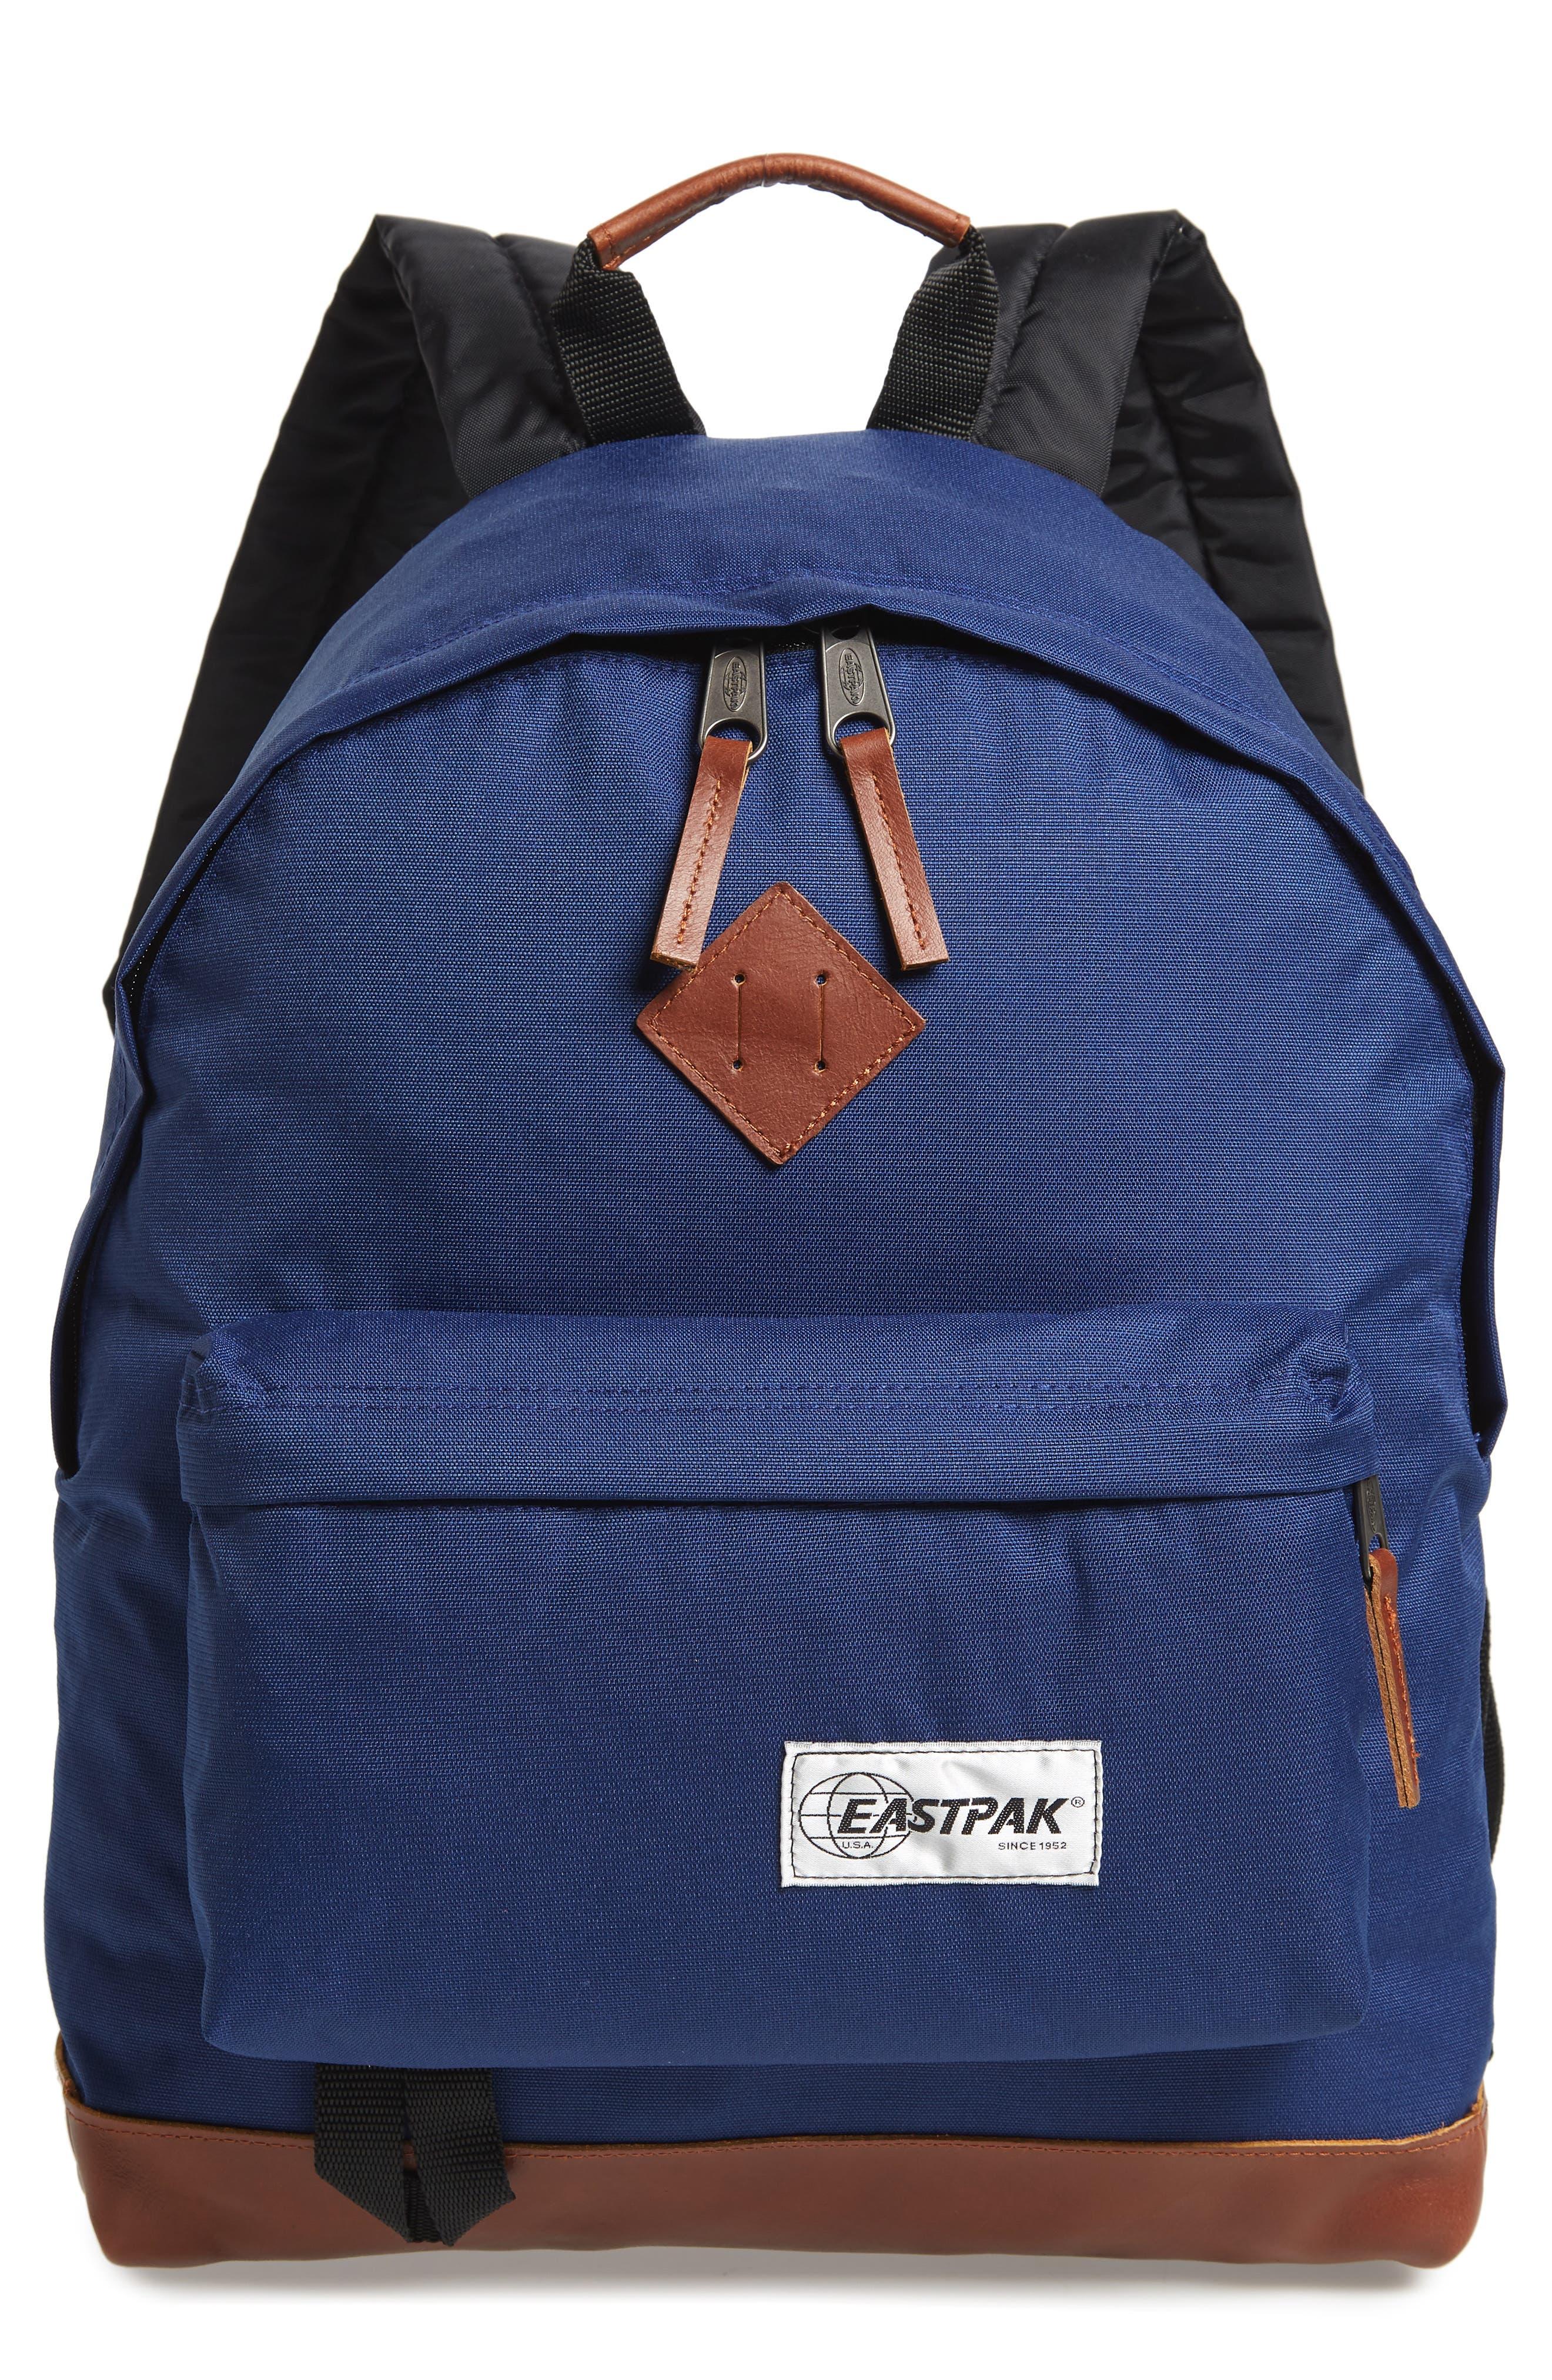 Eastpak Wyoming Backpack - Blue